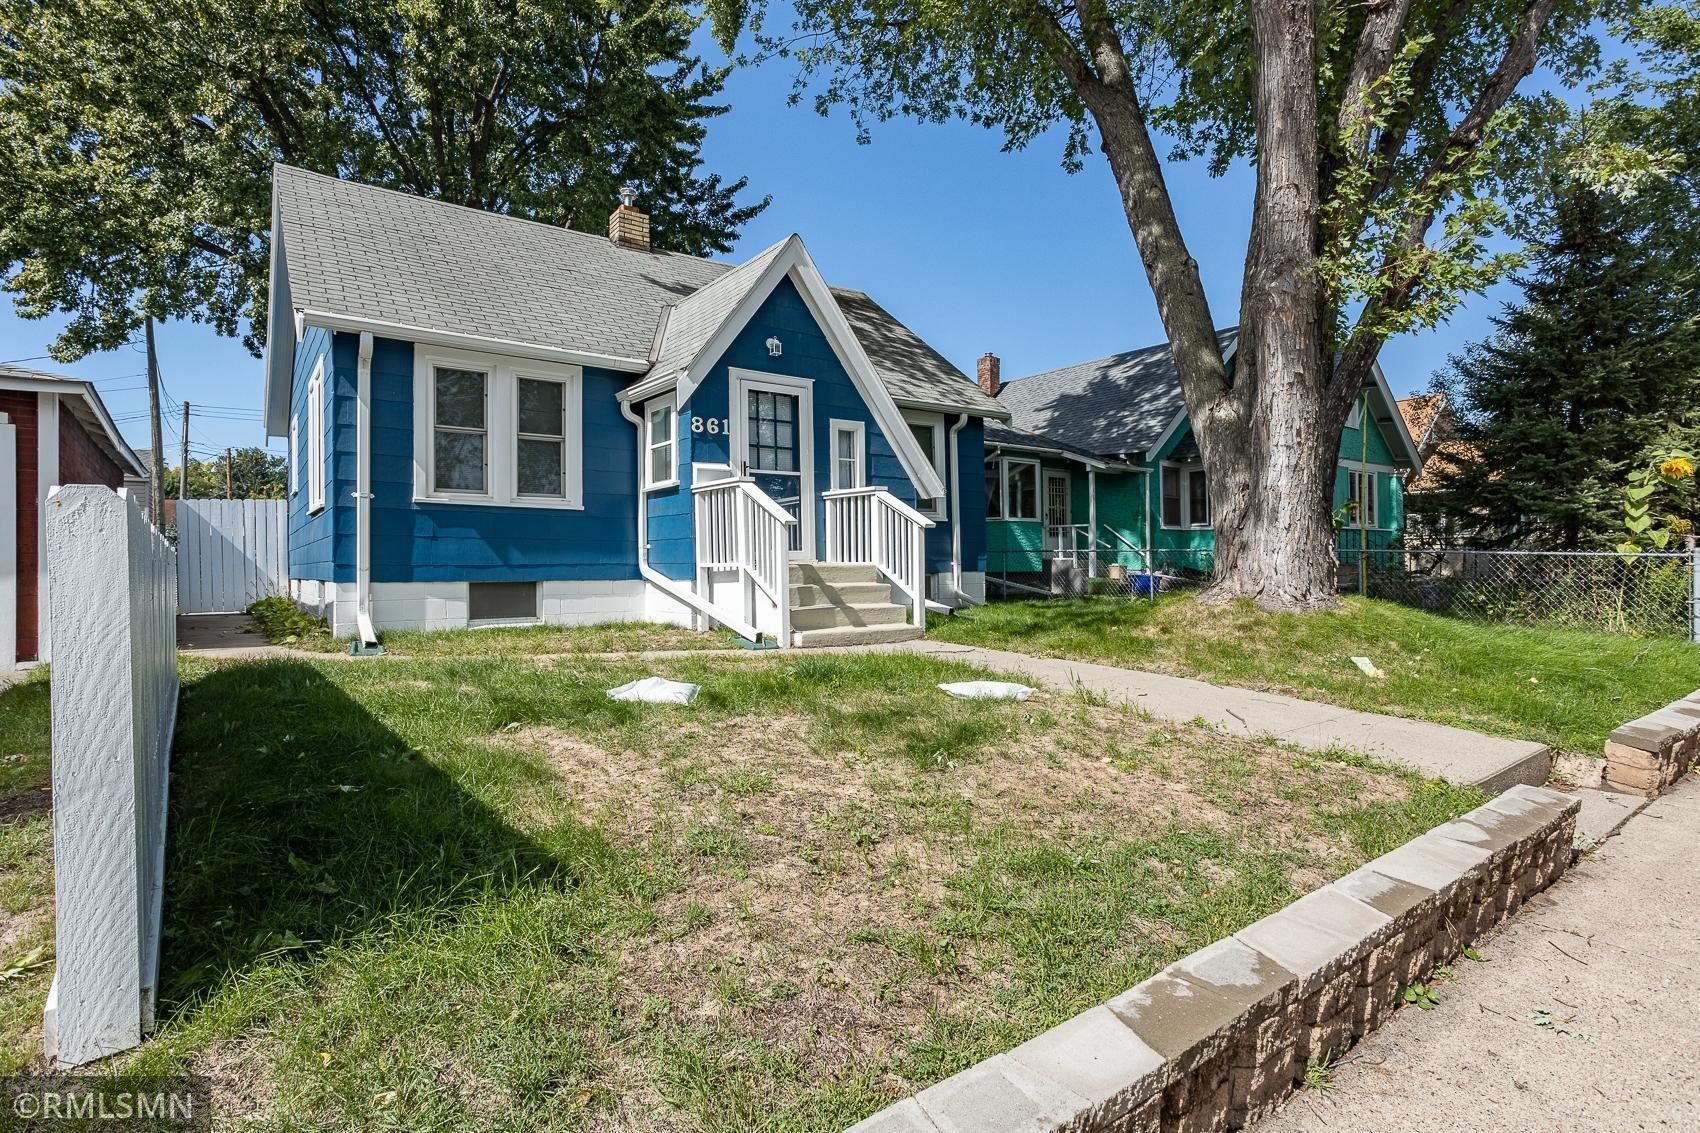 Photo of 861 Hamline Avenue N, Saint Paul, MN 55104 (MLS # 6102846)